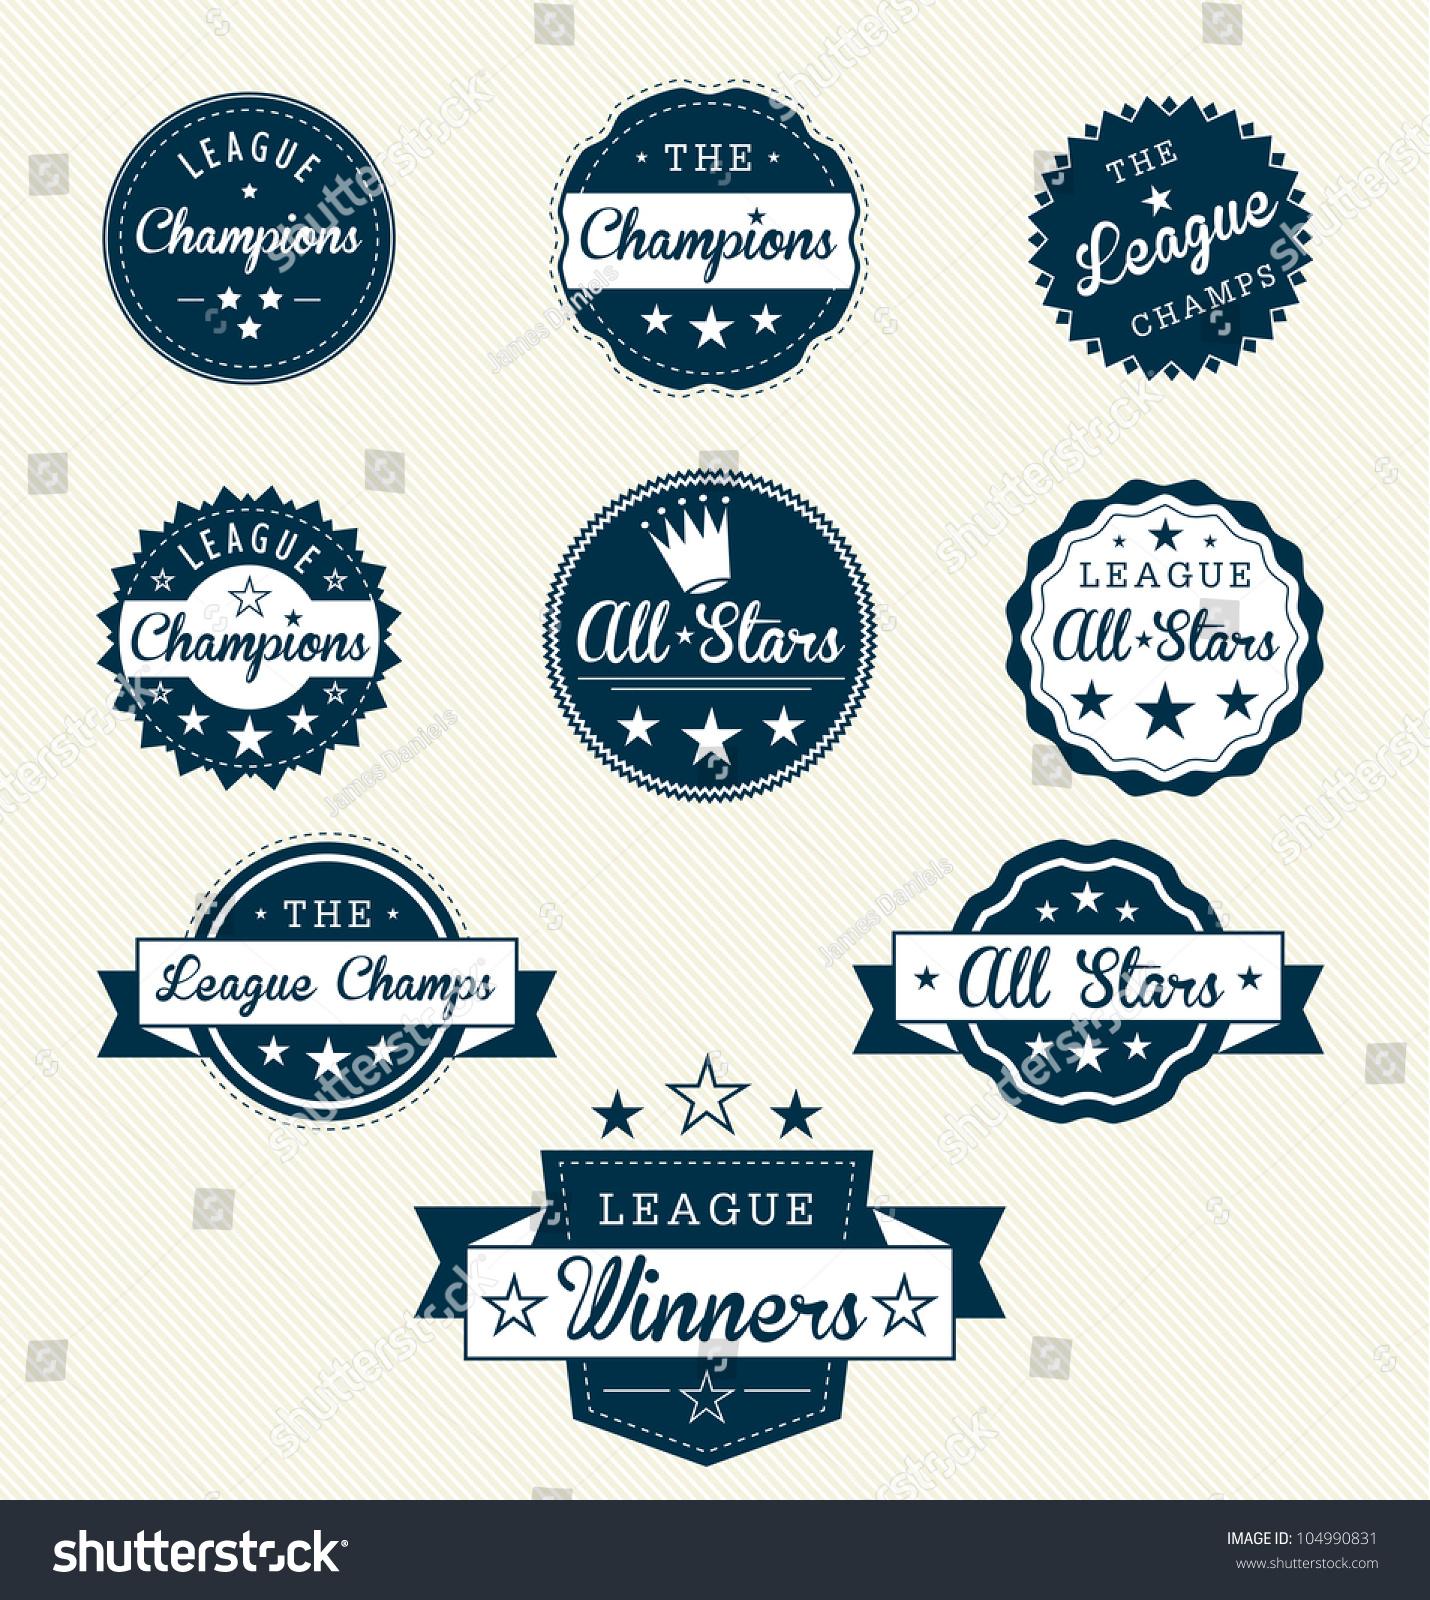 Champions League Vector: Sports Vector Set Vintage Sports Labels Stock Vector